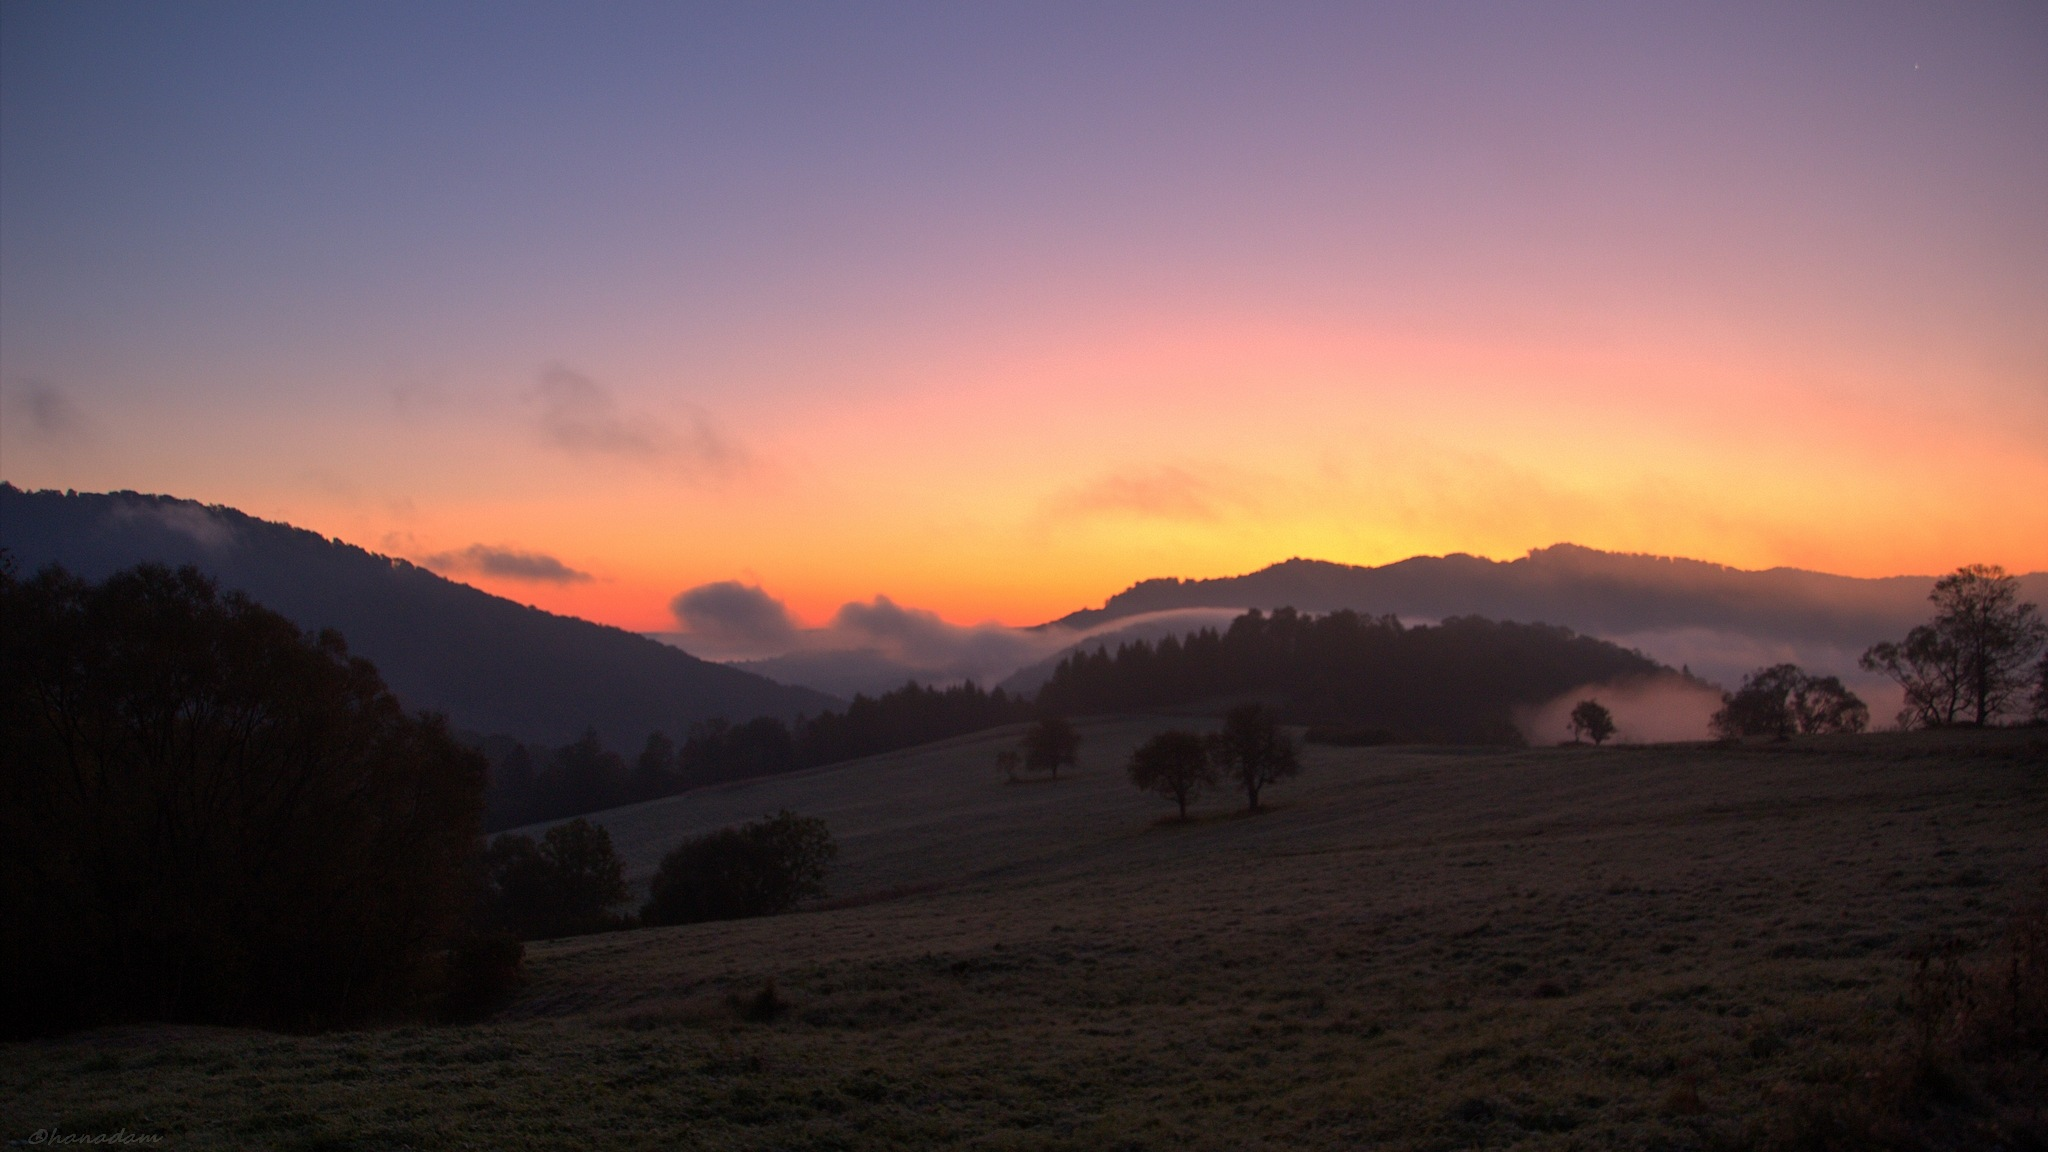 Sunrise by Adam Haniszewski